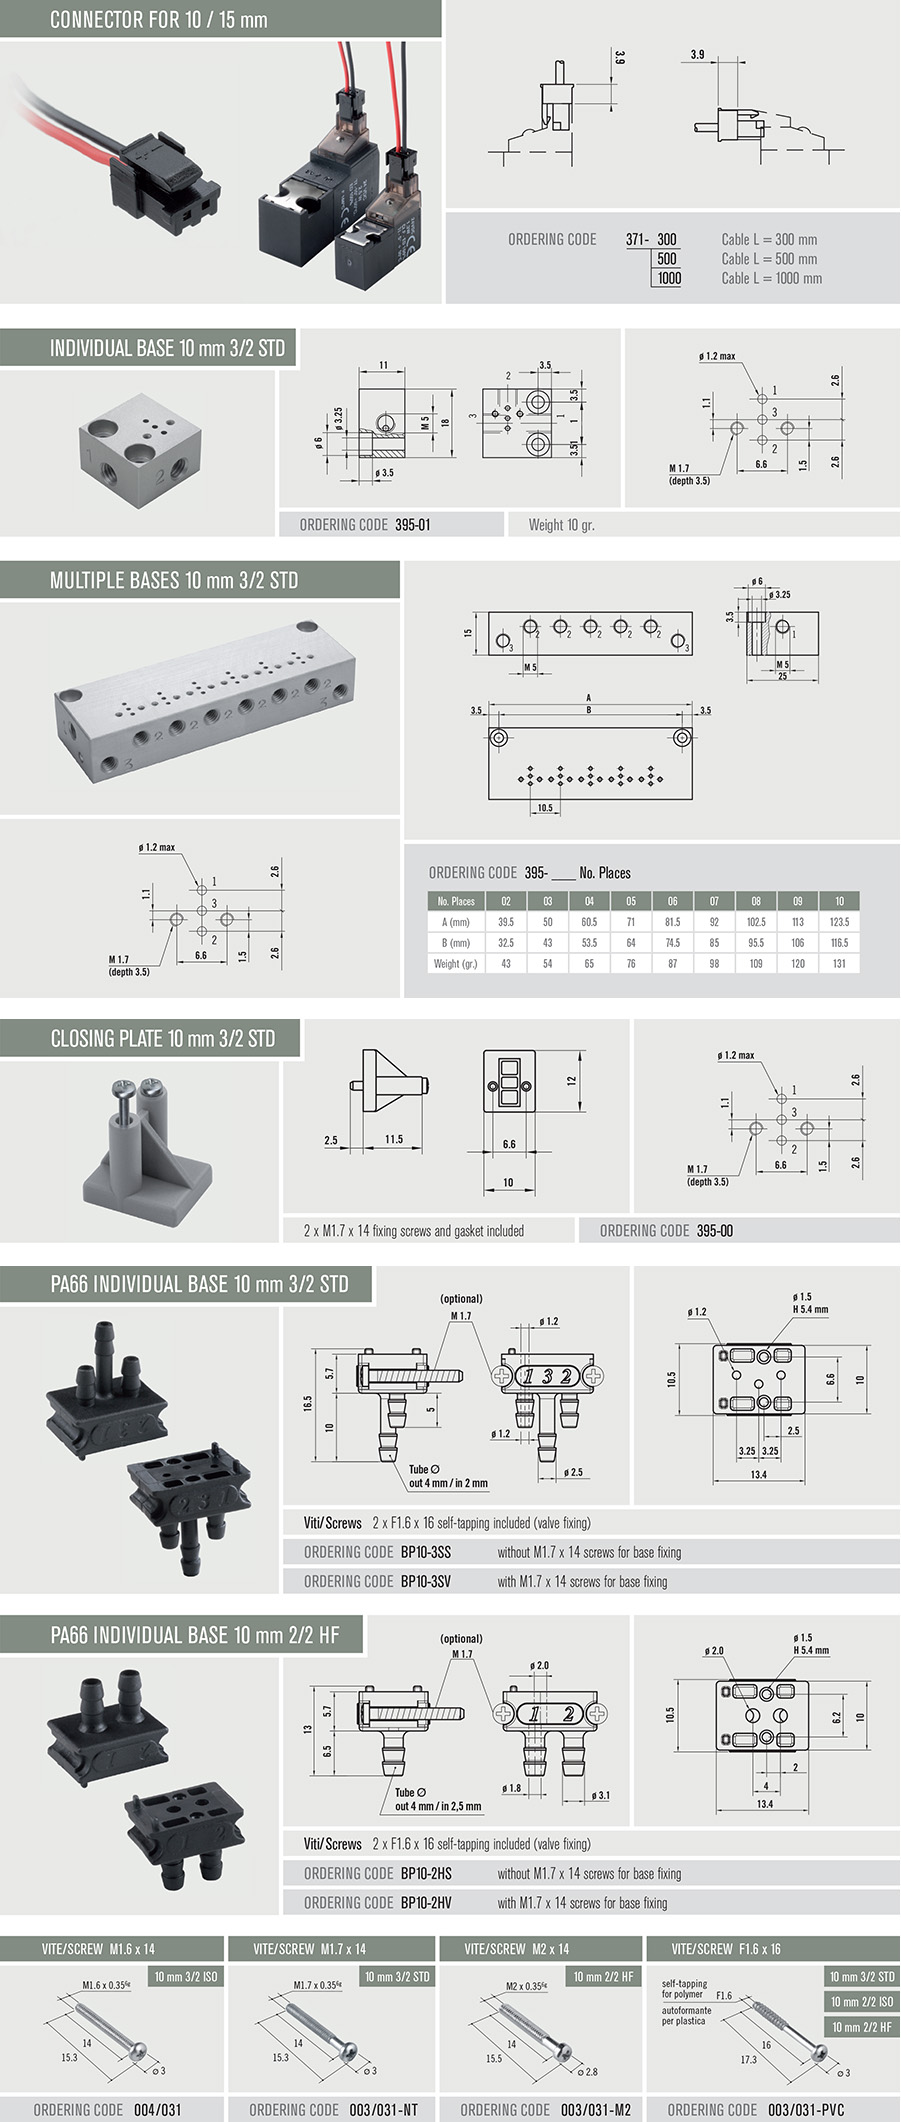 accessories-10-mm